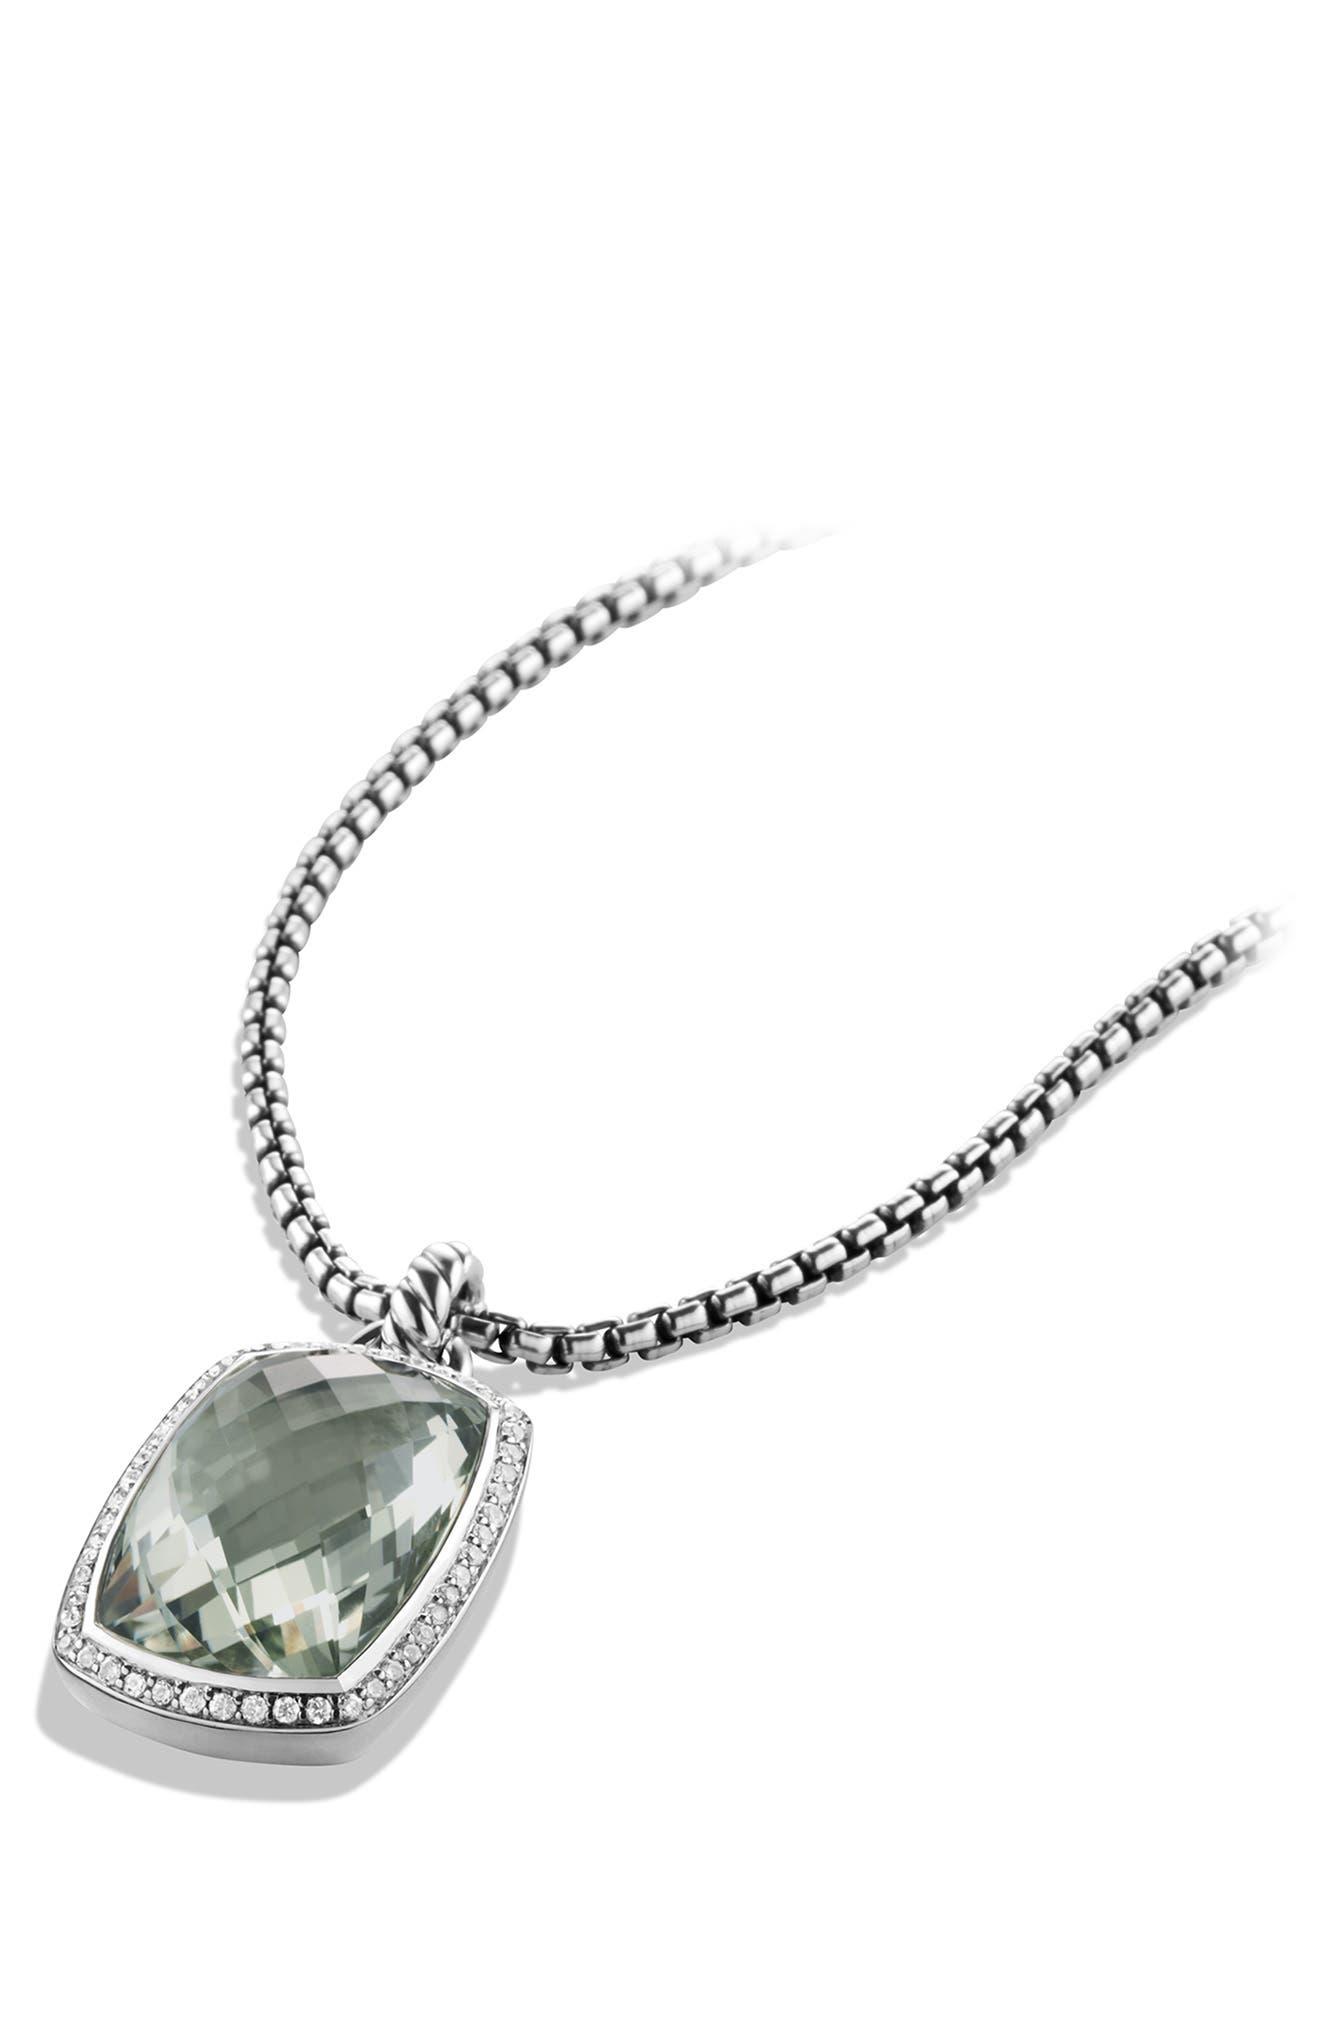 'Albion' Pendant with Semiprecious Stone and Diamonds,                             Alternate thumbnail 3, color,                             330